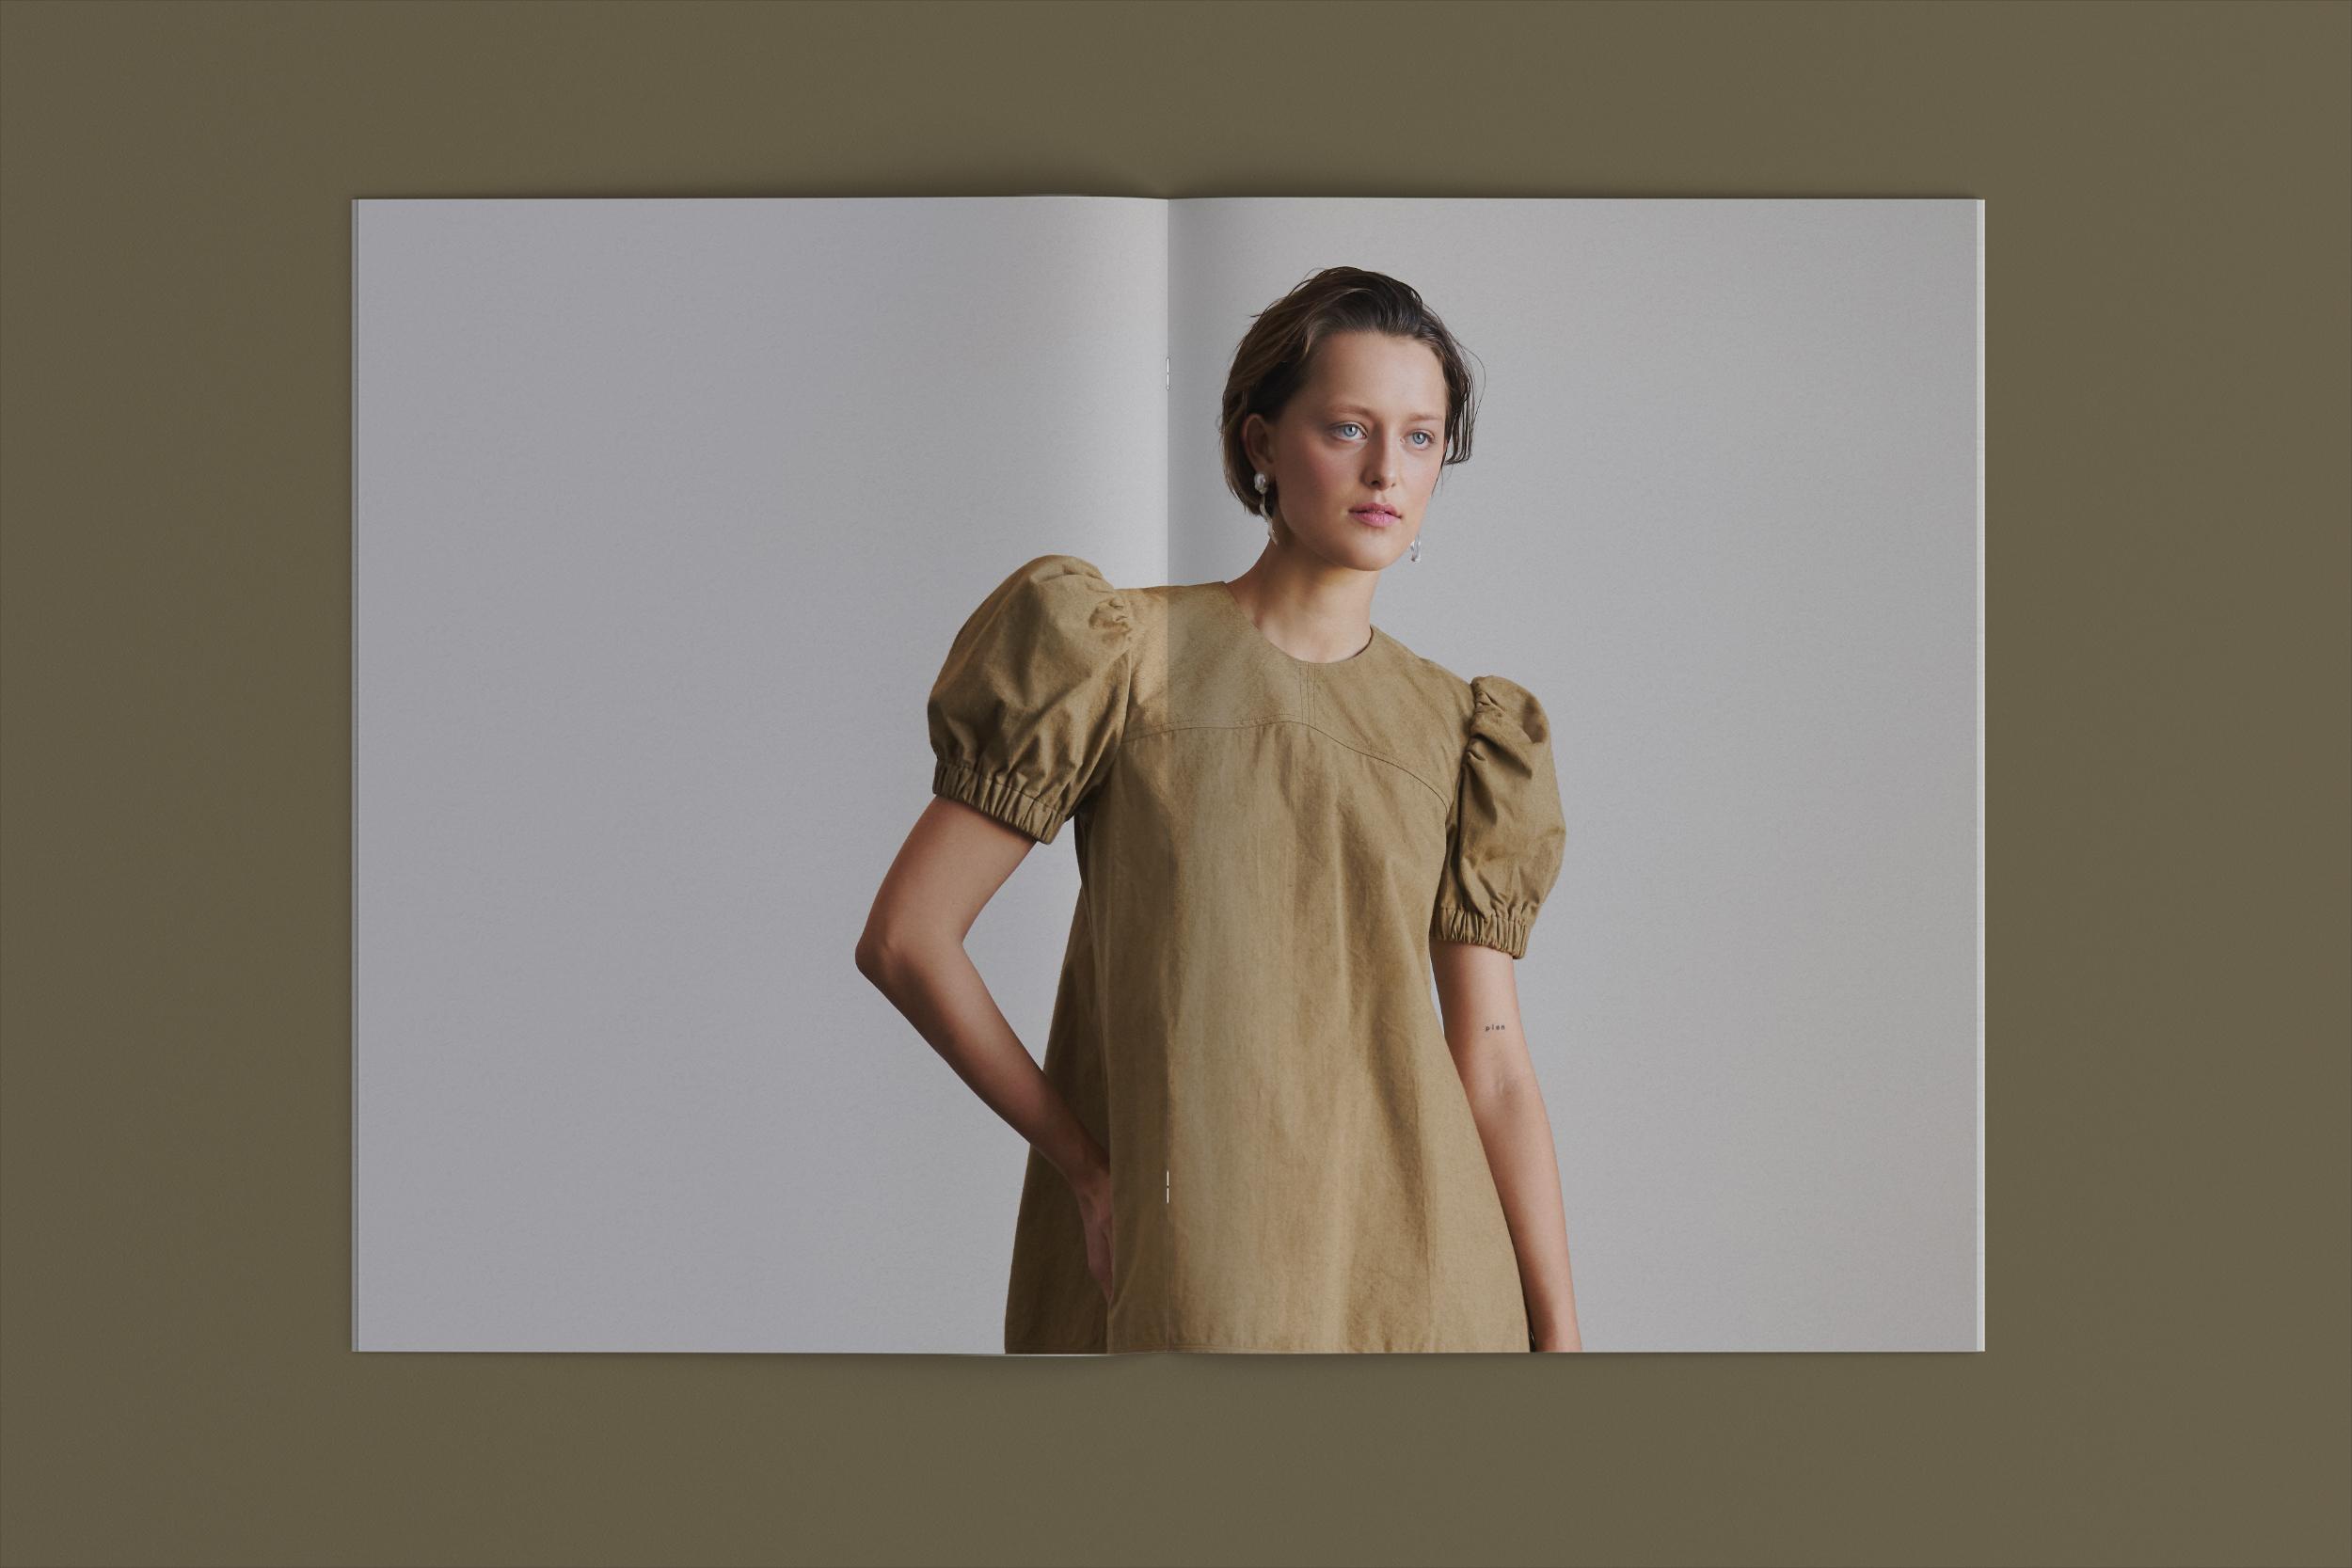 Fabiana-Pigna-Lookbook-FW19-spread2.jpg